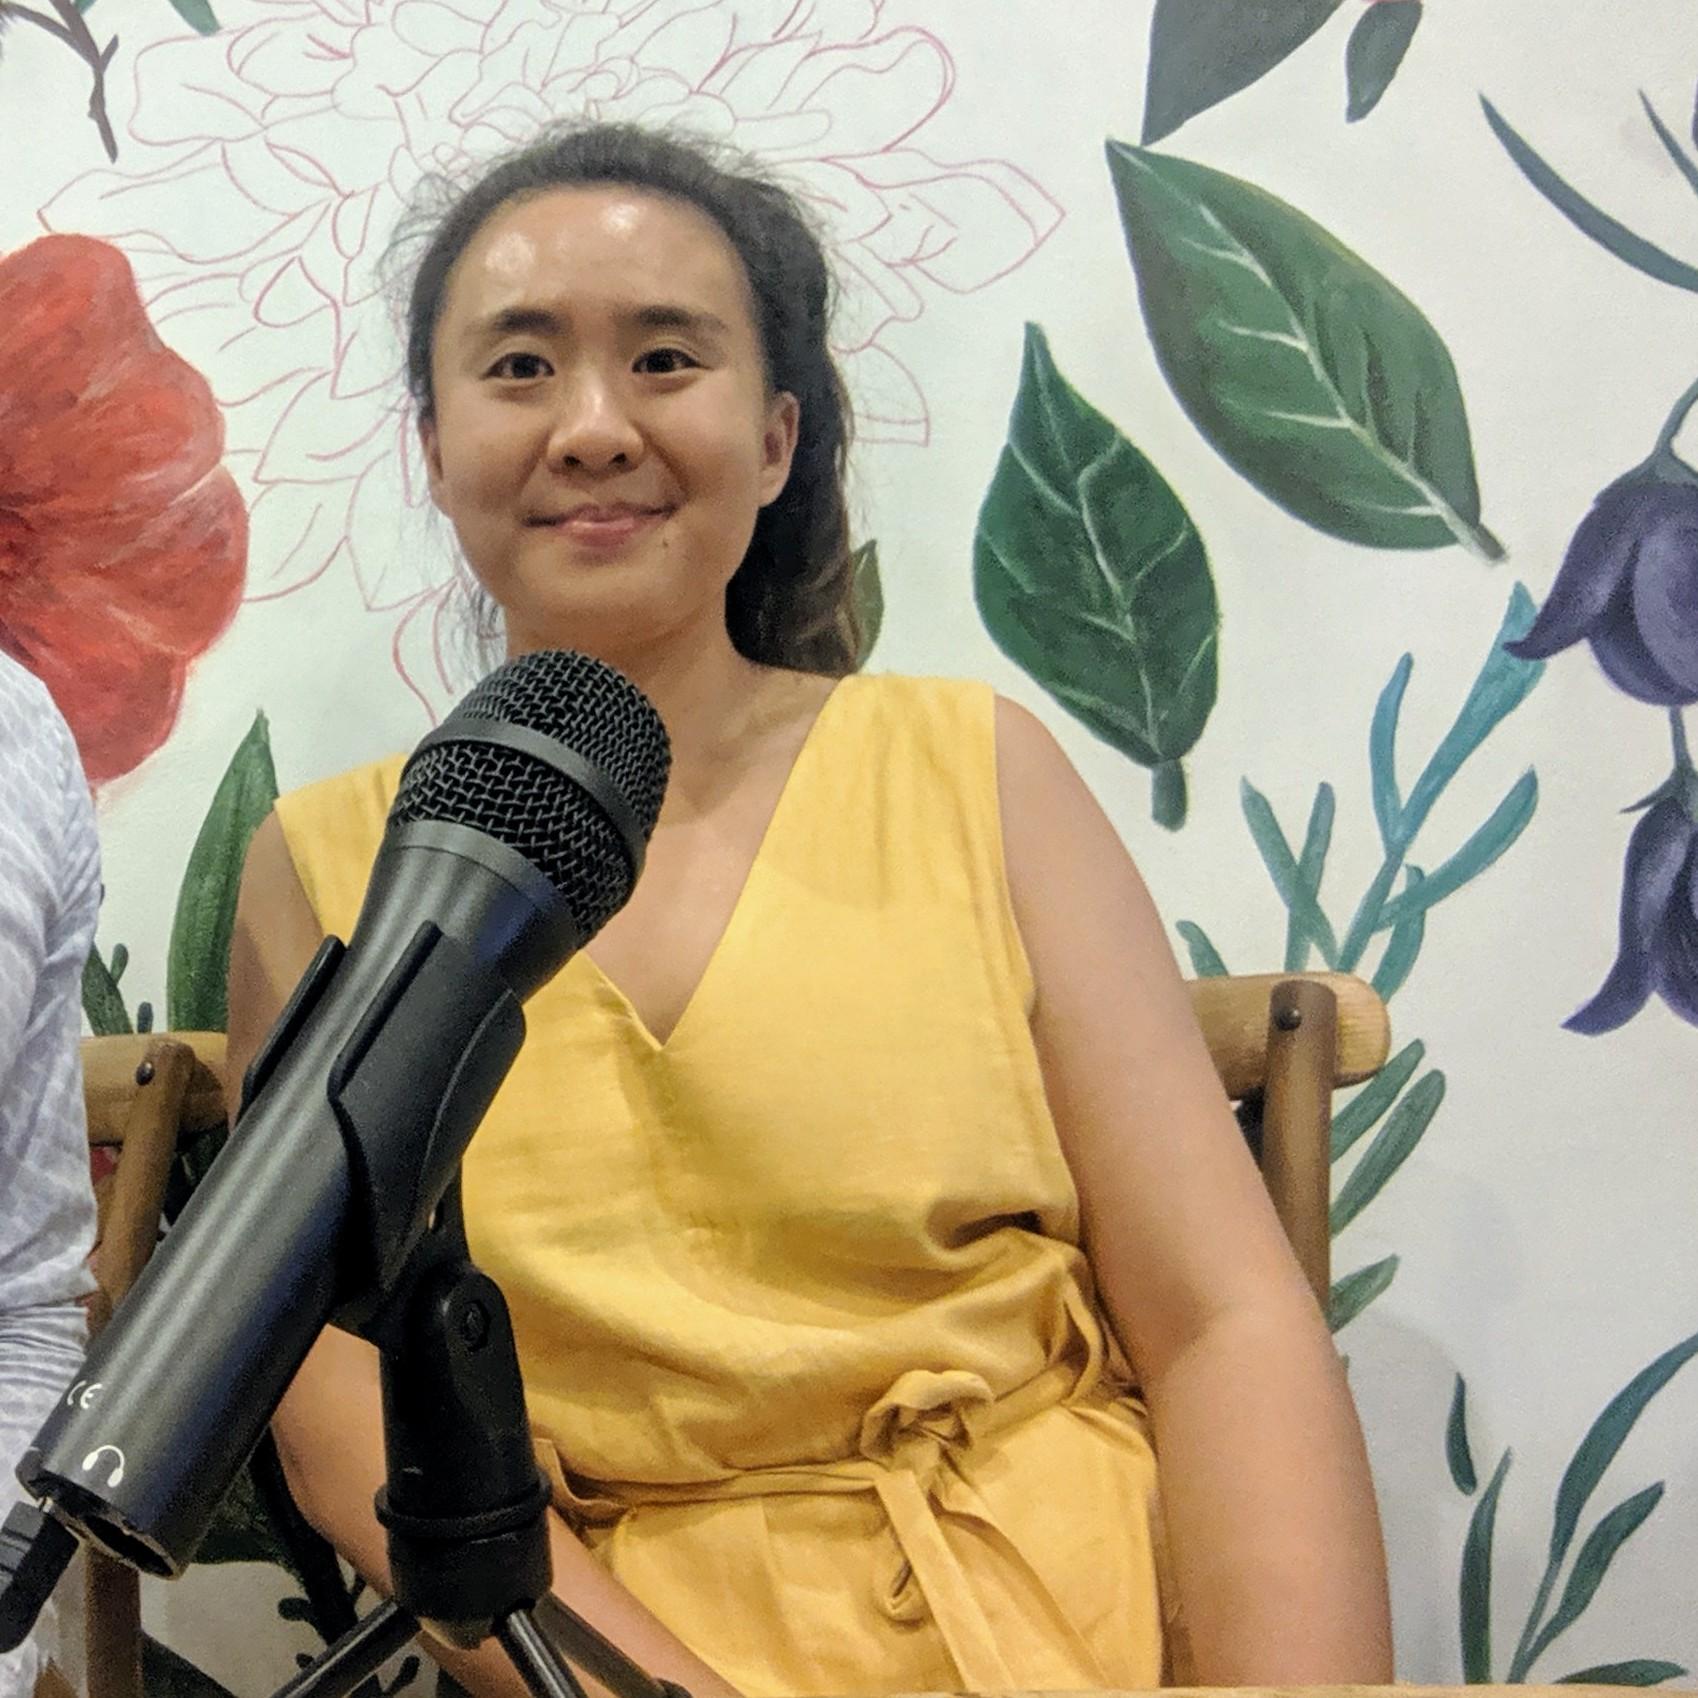 #009 Shinny Chia: Australia to Brunei in a loaded dip